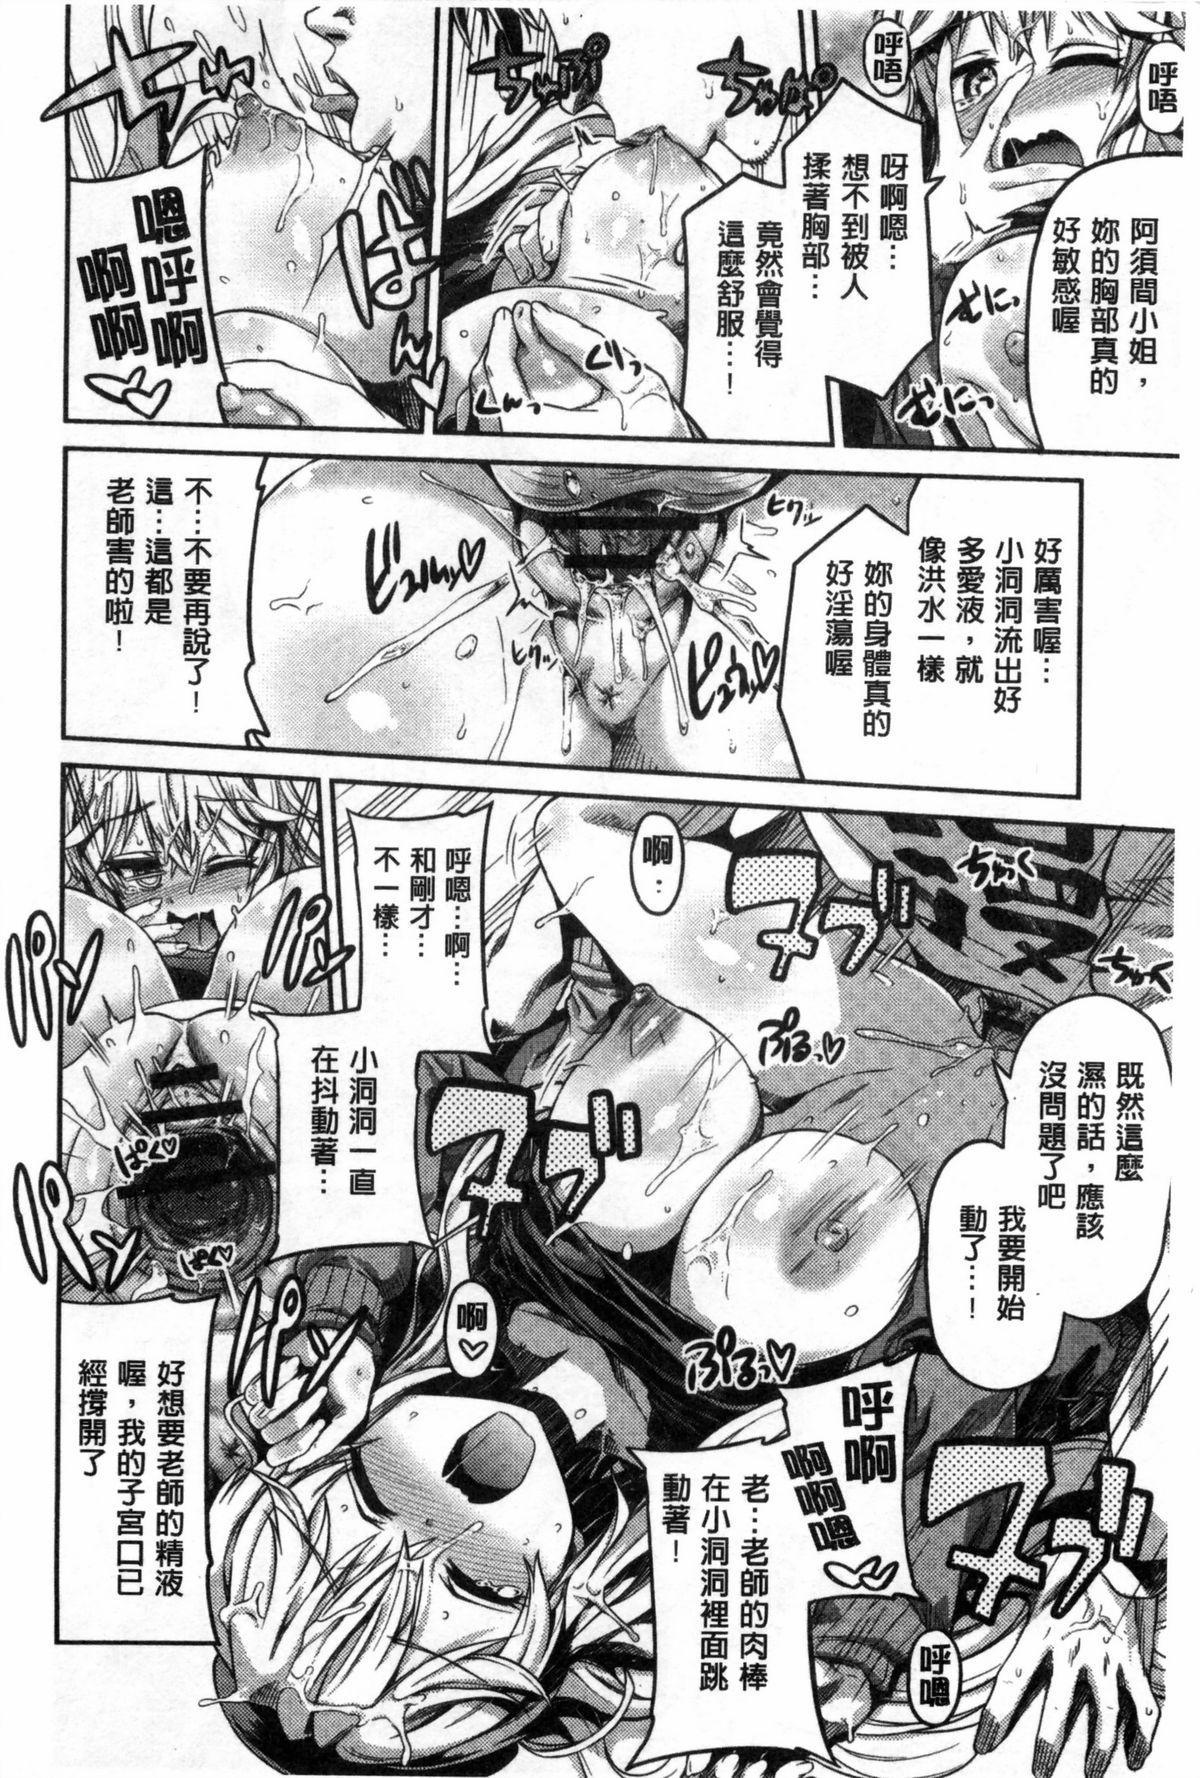 Man x Koi - Ero Manga de Hajimaru Koi no Plot   A漫×戀情 由情色漫畫所萌生的戀之物語 24